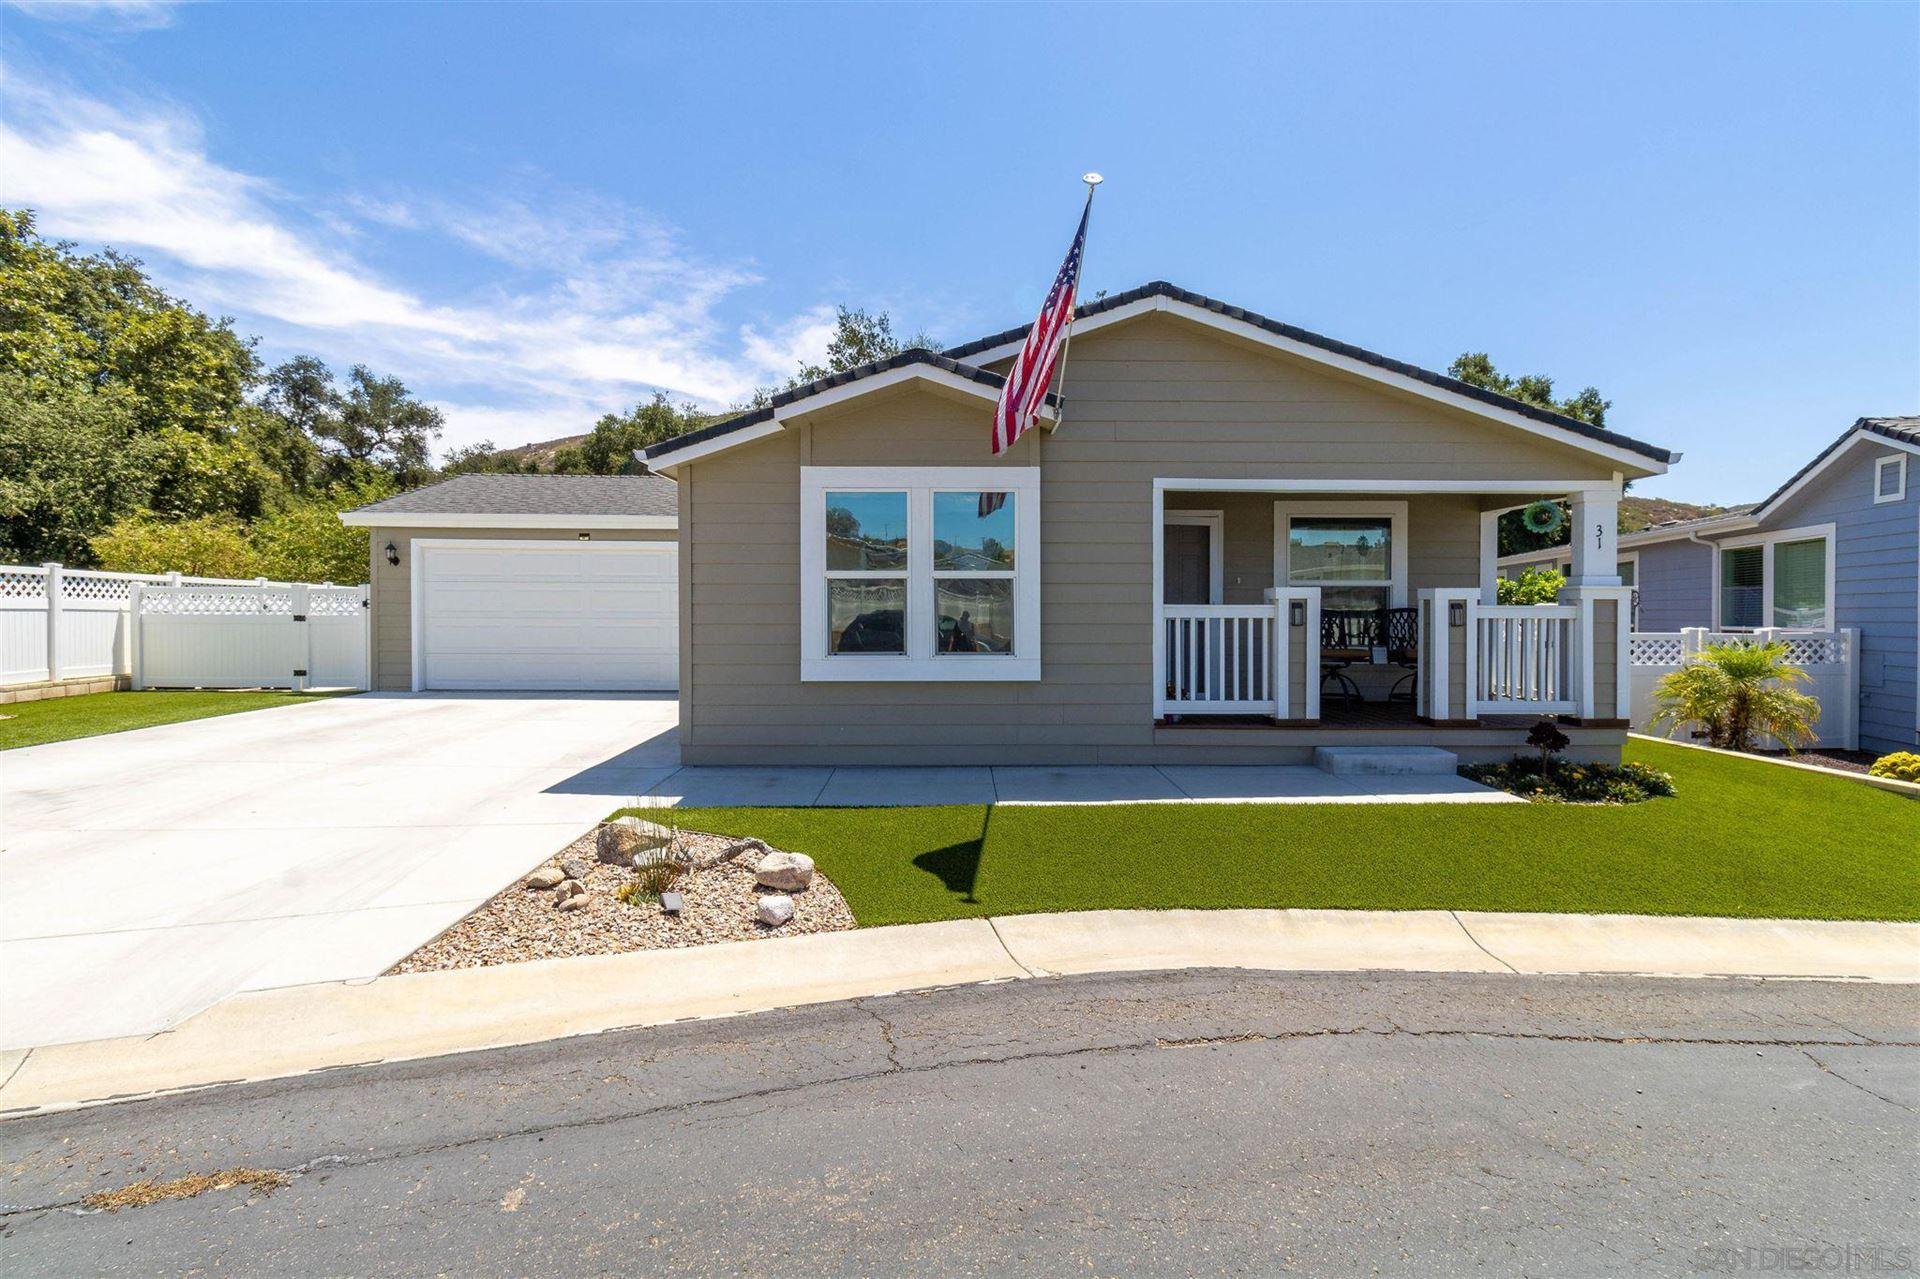 Photo of 2239 Black Canyon Rd #SPC 31, Ramona, CA 92065 (MLS # 210020860)